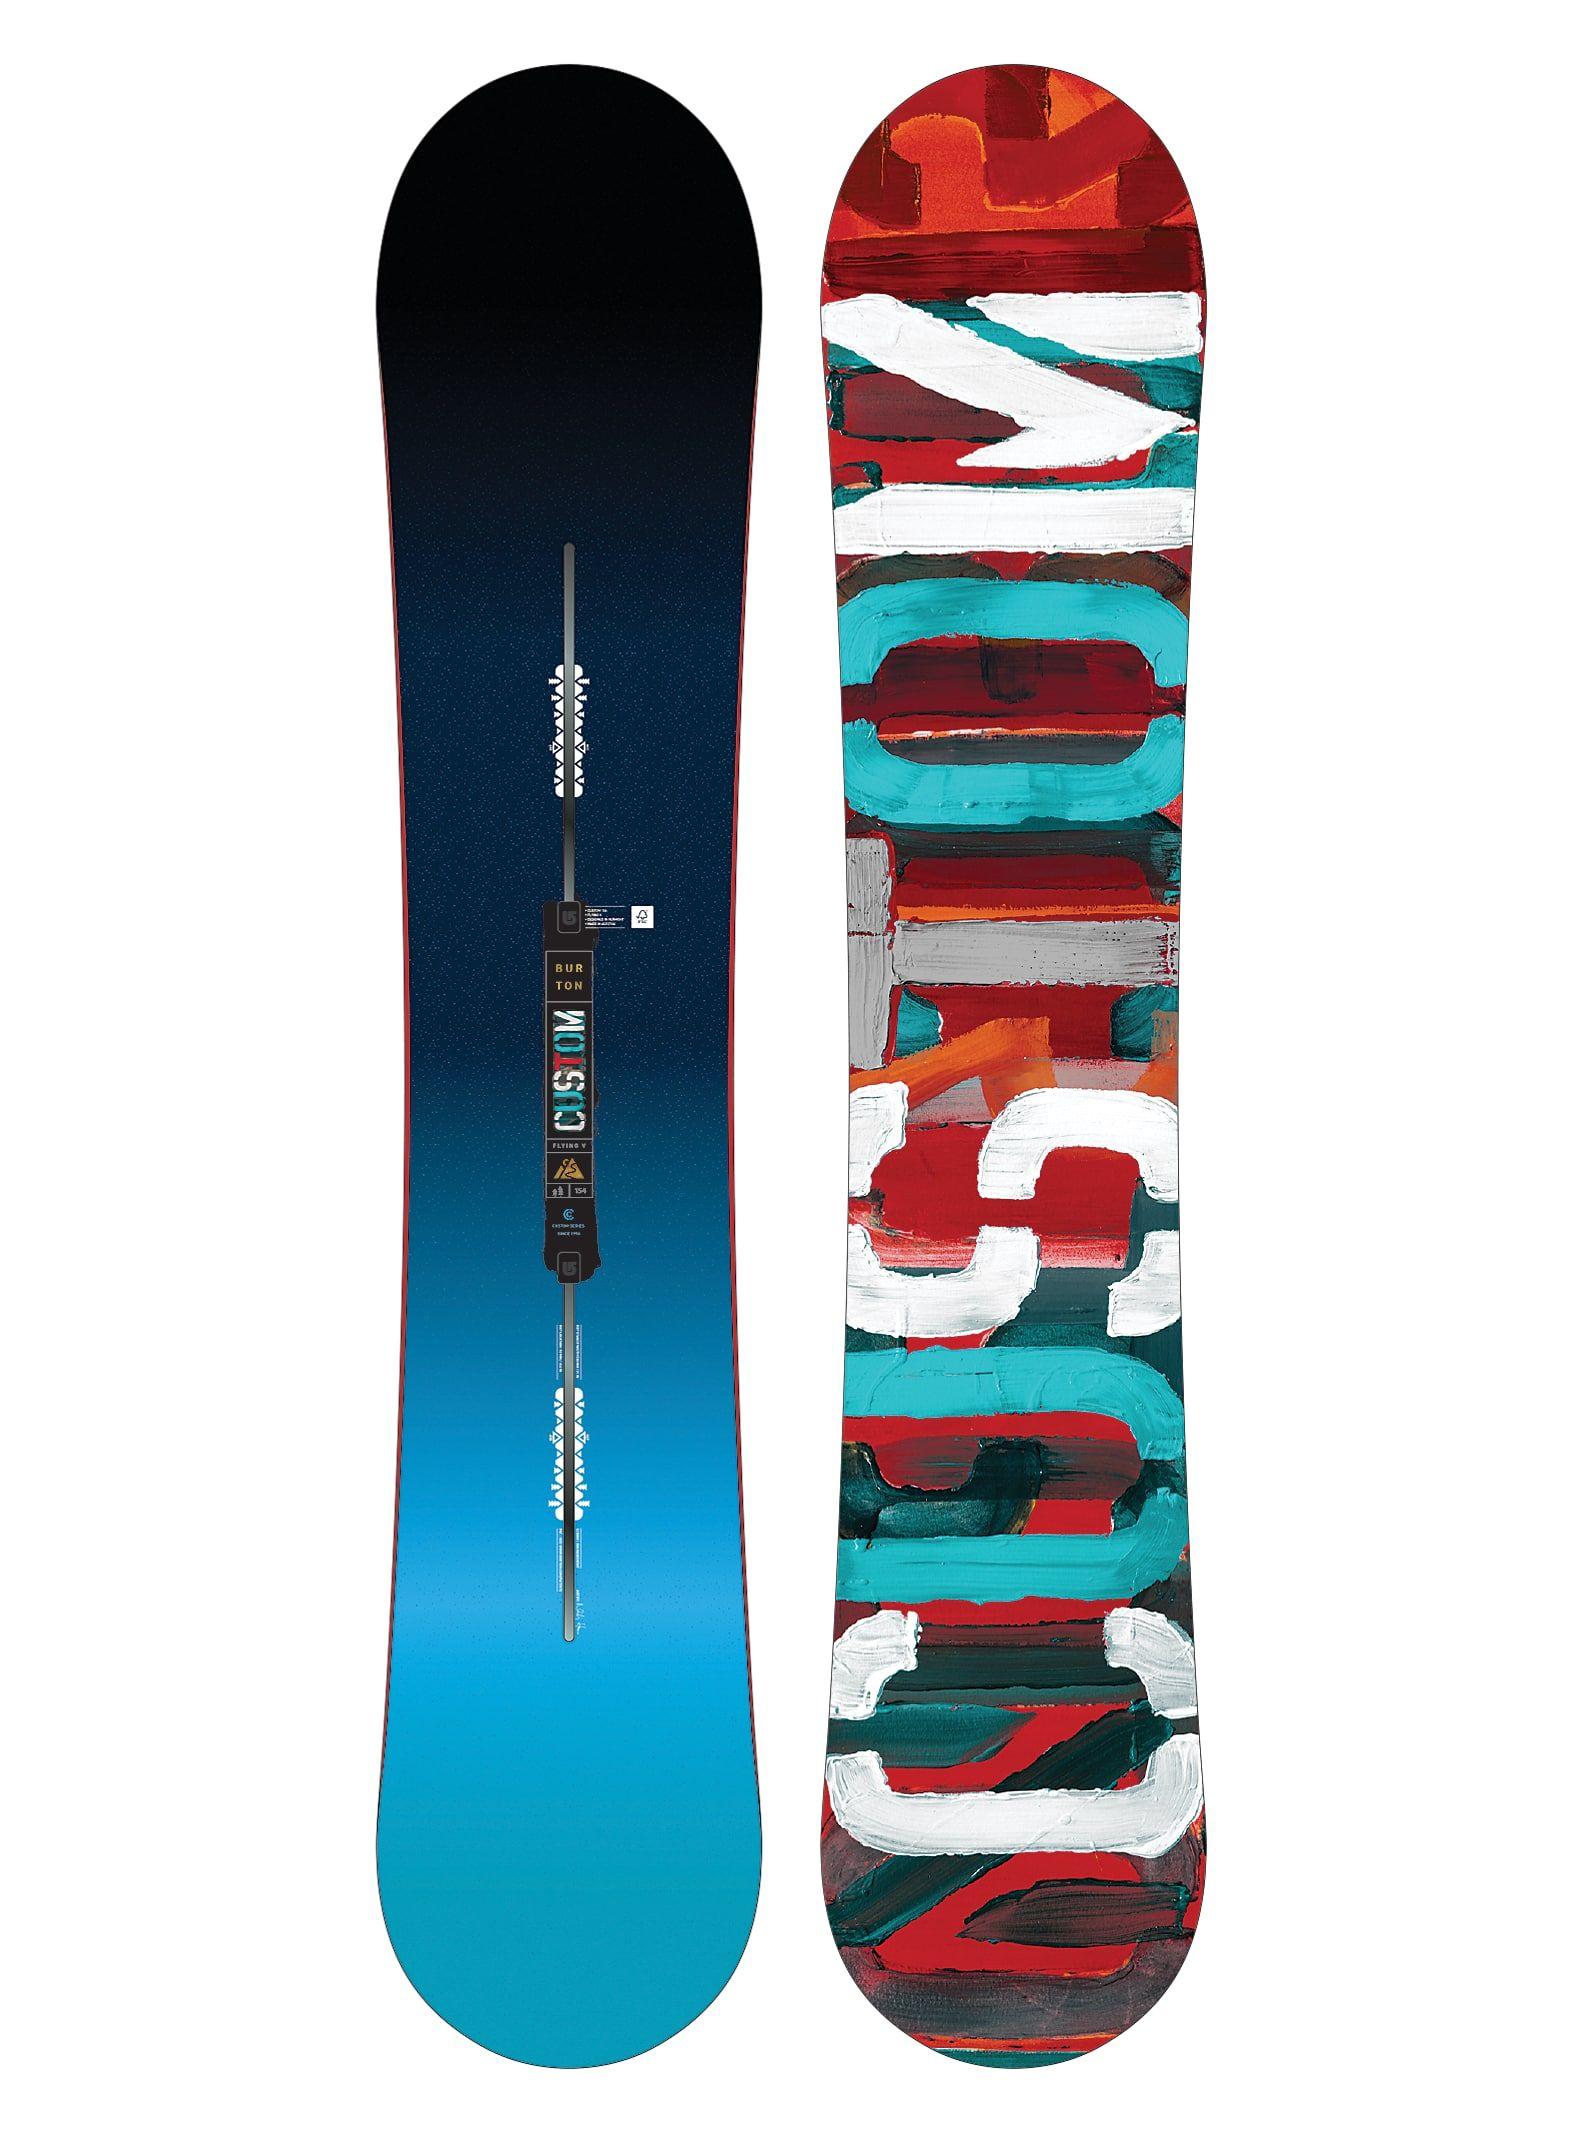 Men's Snowboarding Gear The Snowboard Asylum